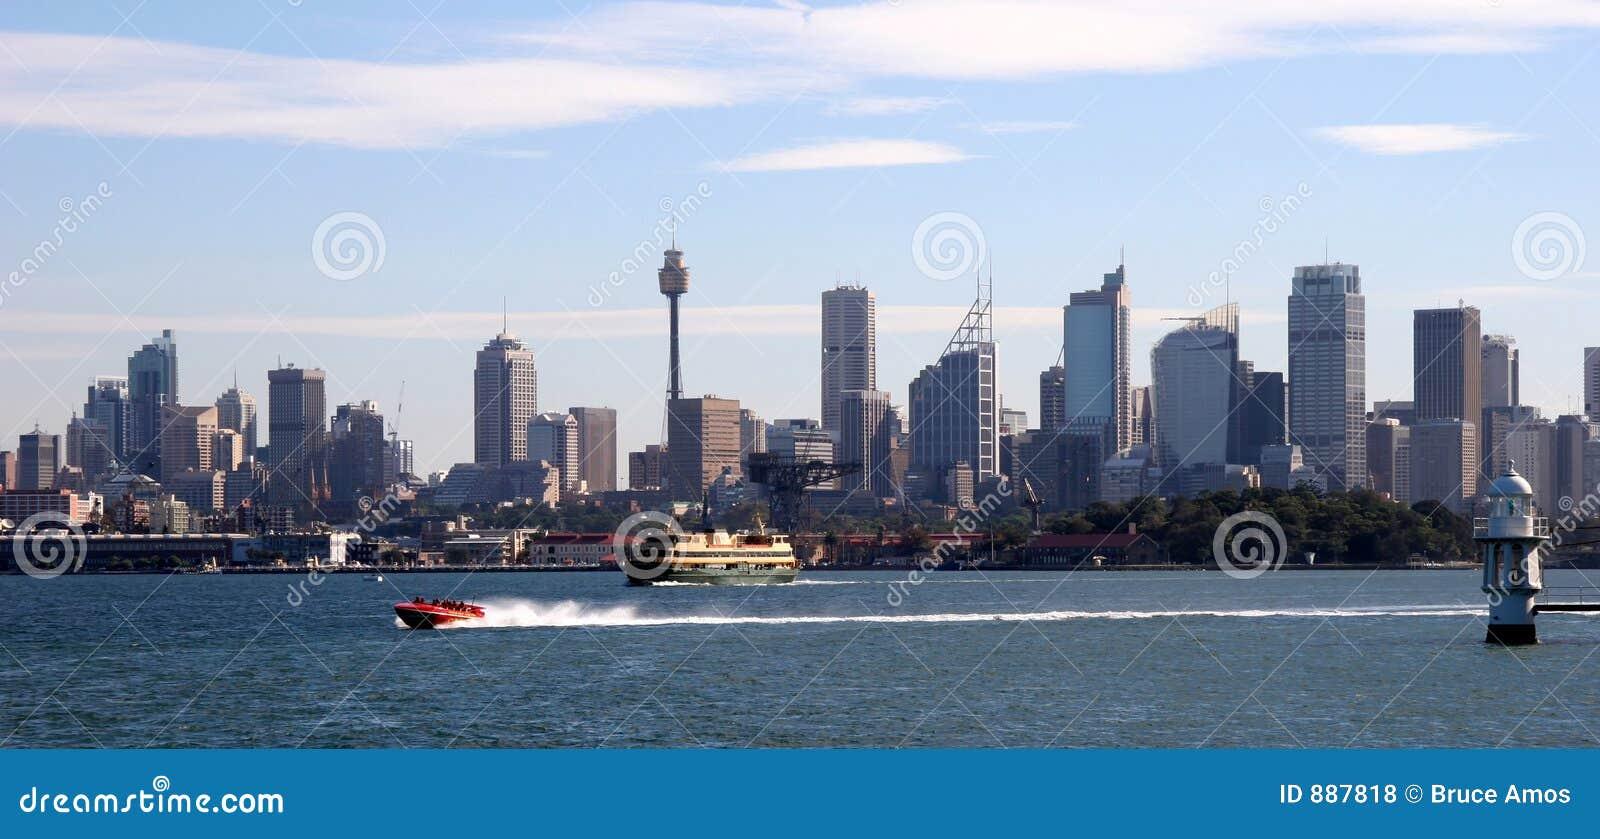 Linia horyzontu Sydney australii